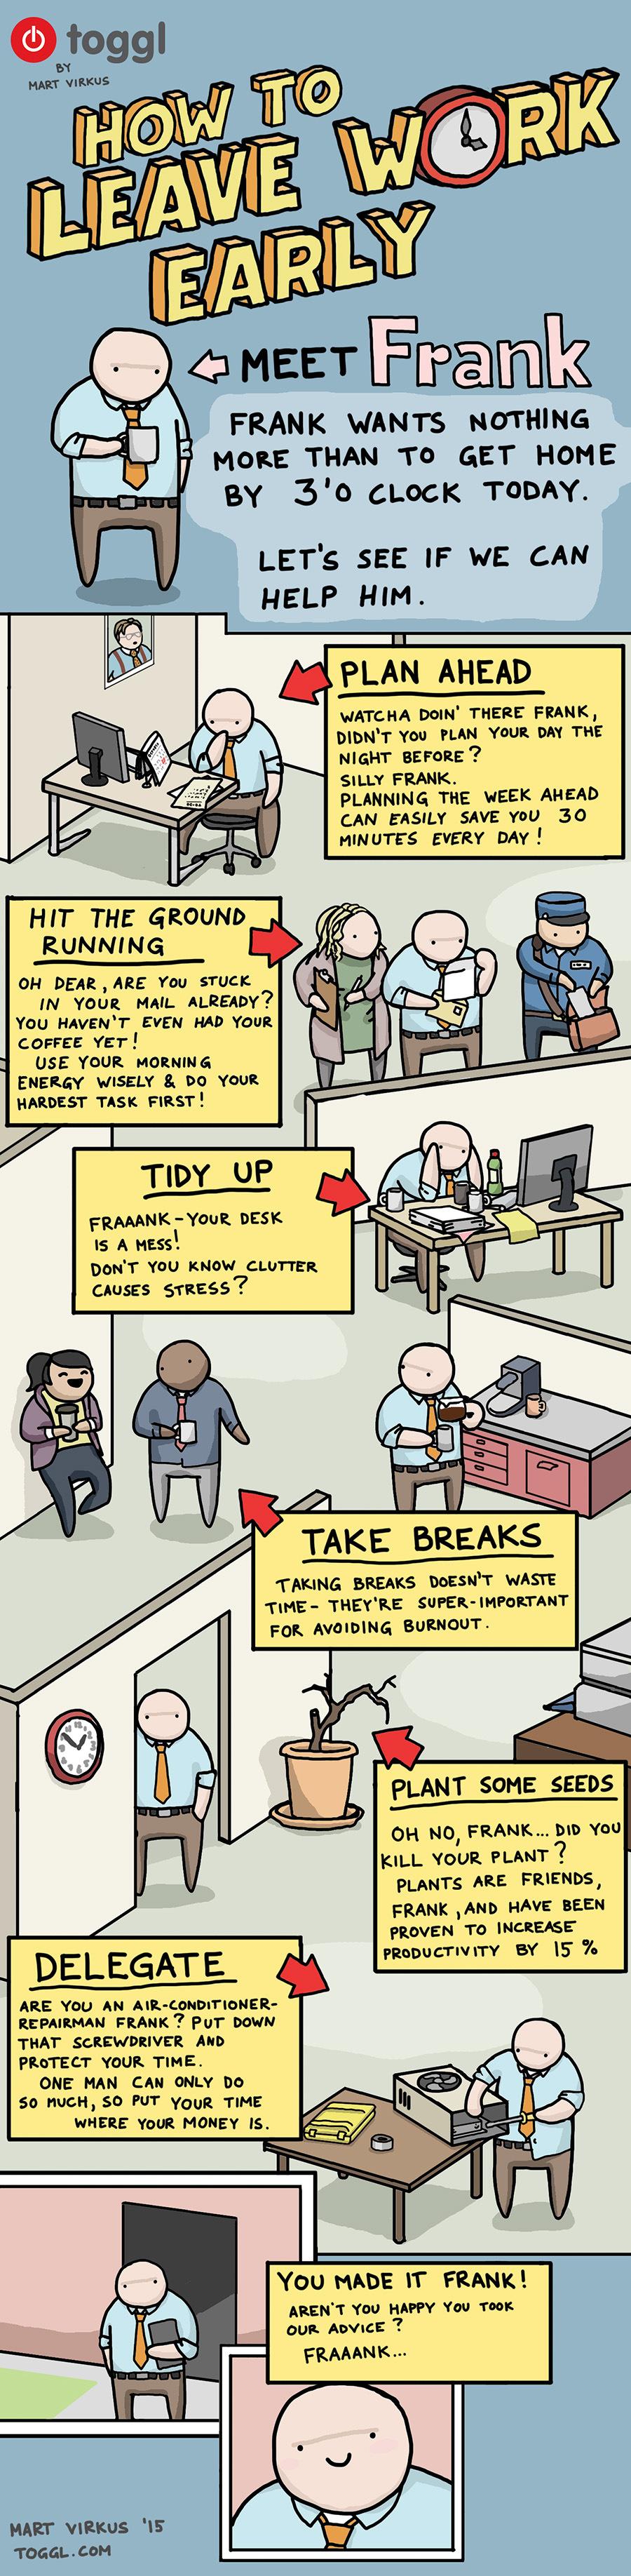 Office Productivity Tips